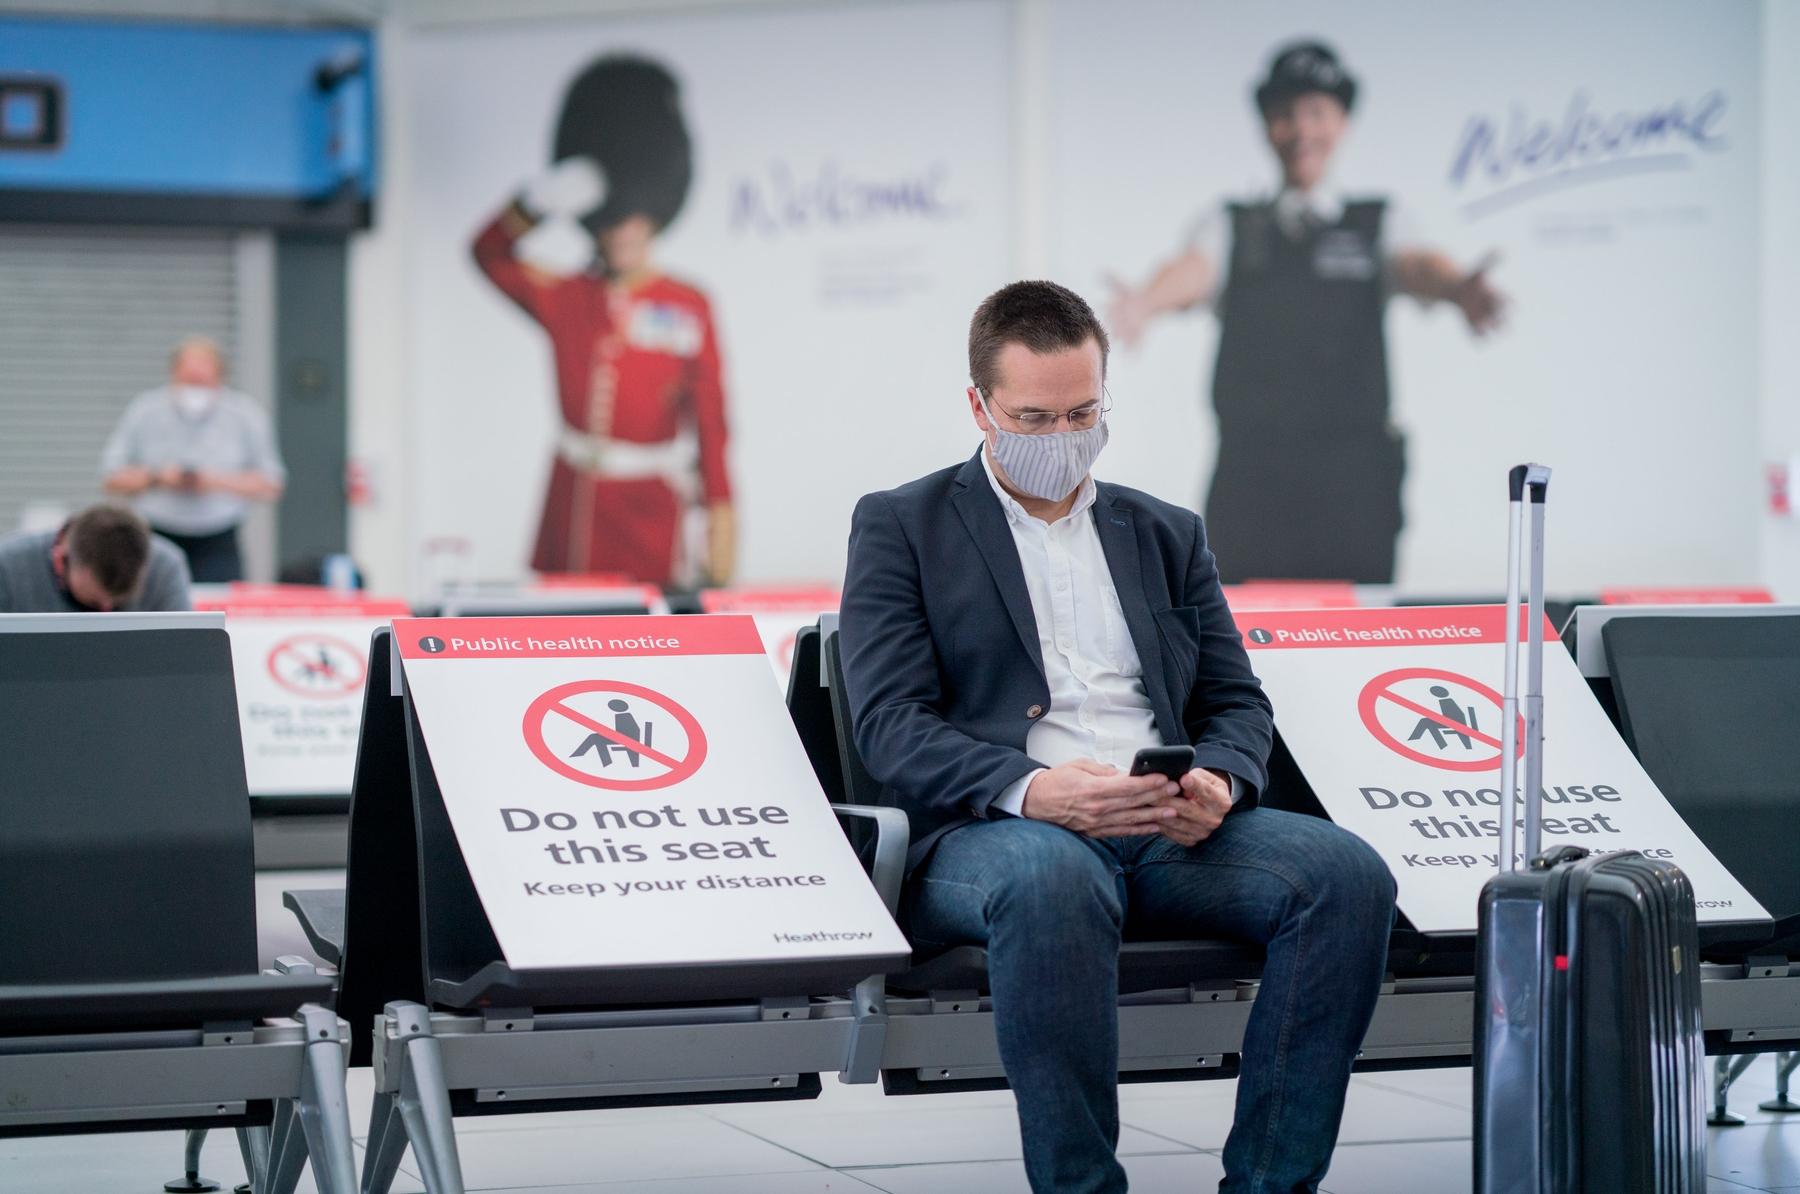 Man waiting at airport during coronavirus